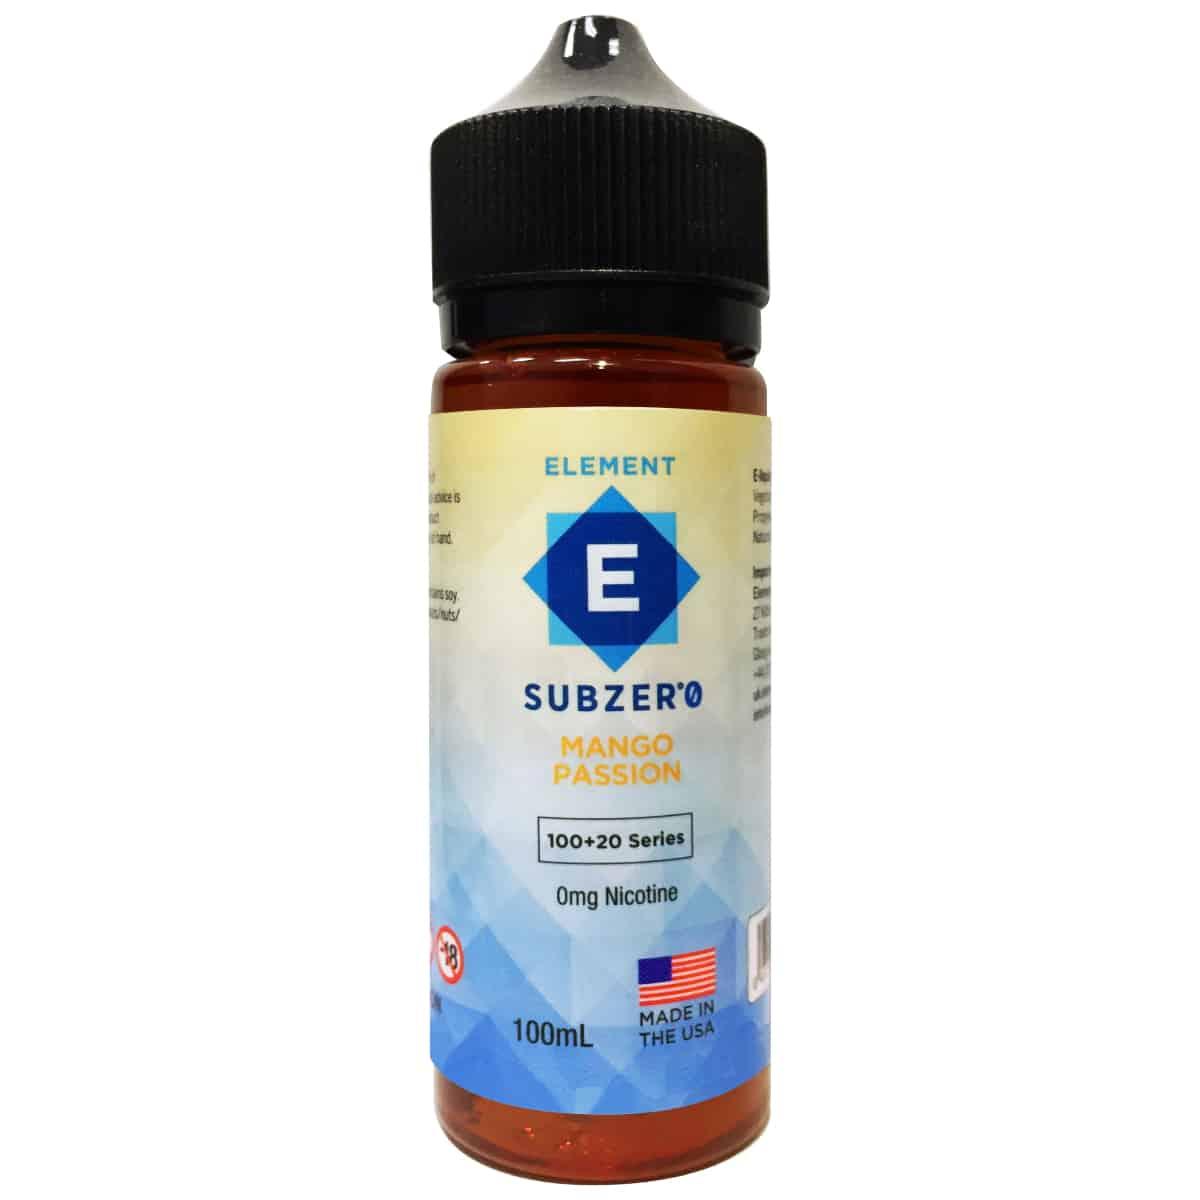 Mango Passion Element Subzero Shortfill 100ml